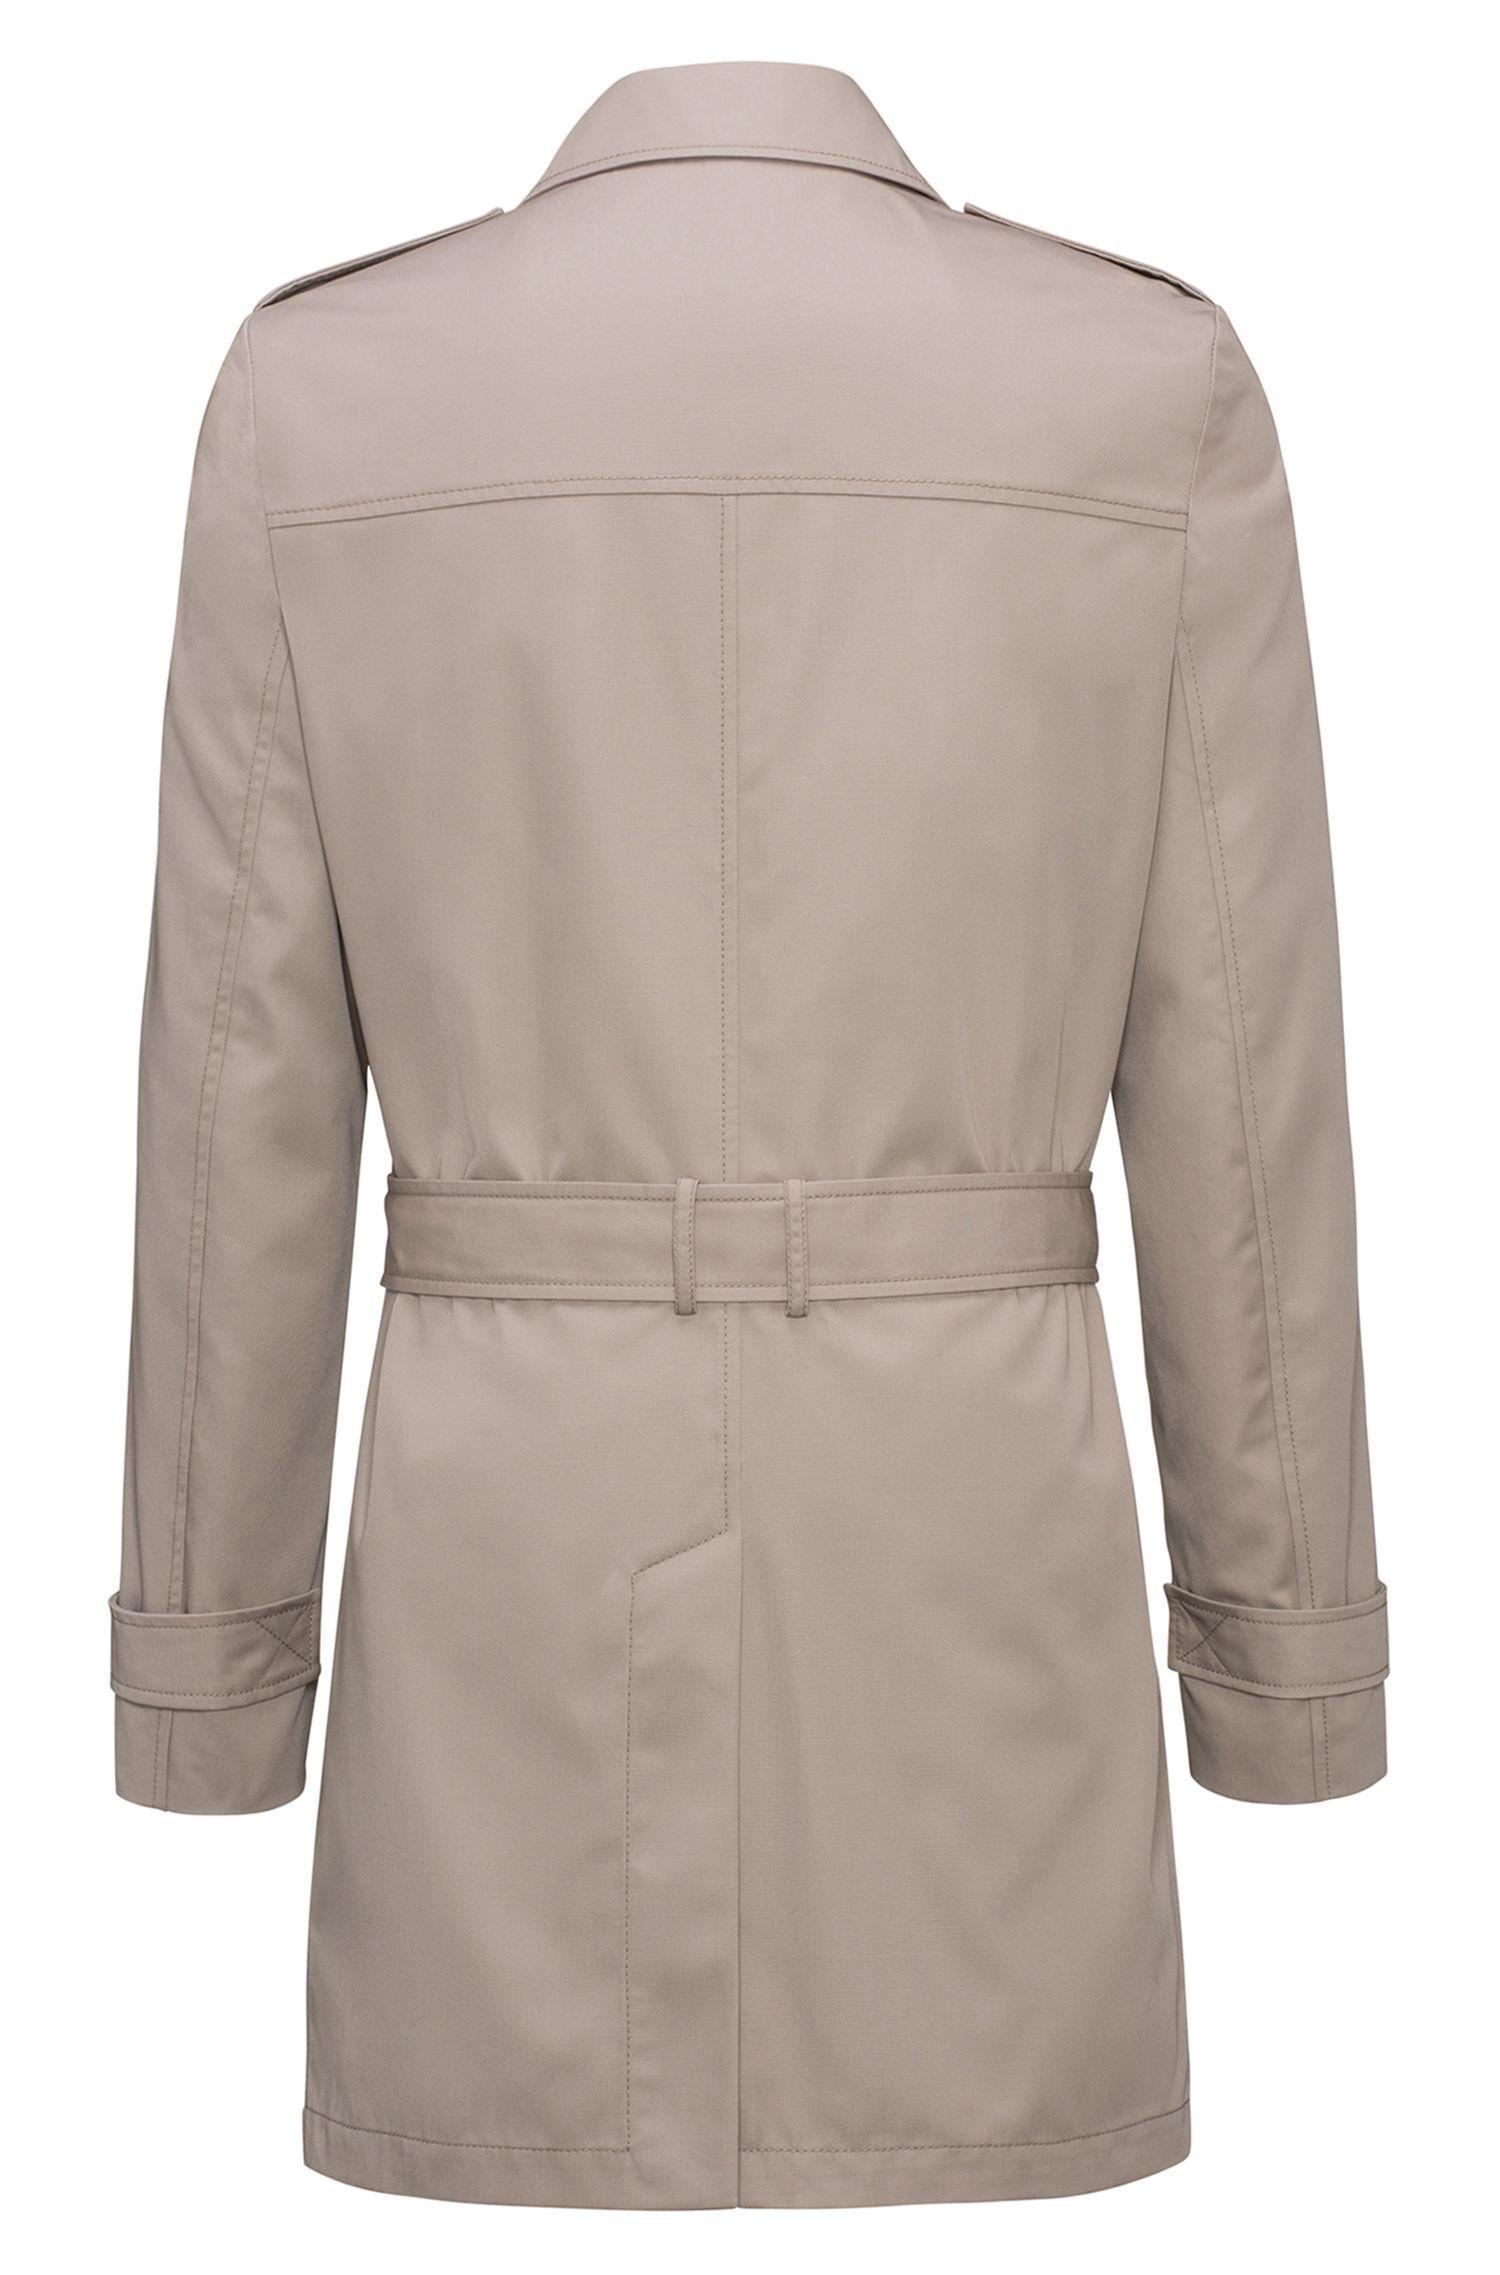 Trench-coat Slim Fit en tissu imperméable